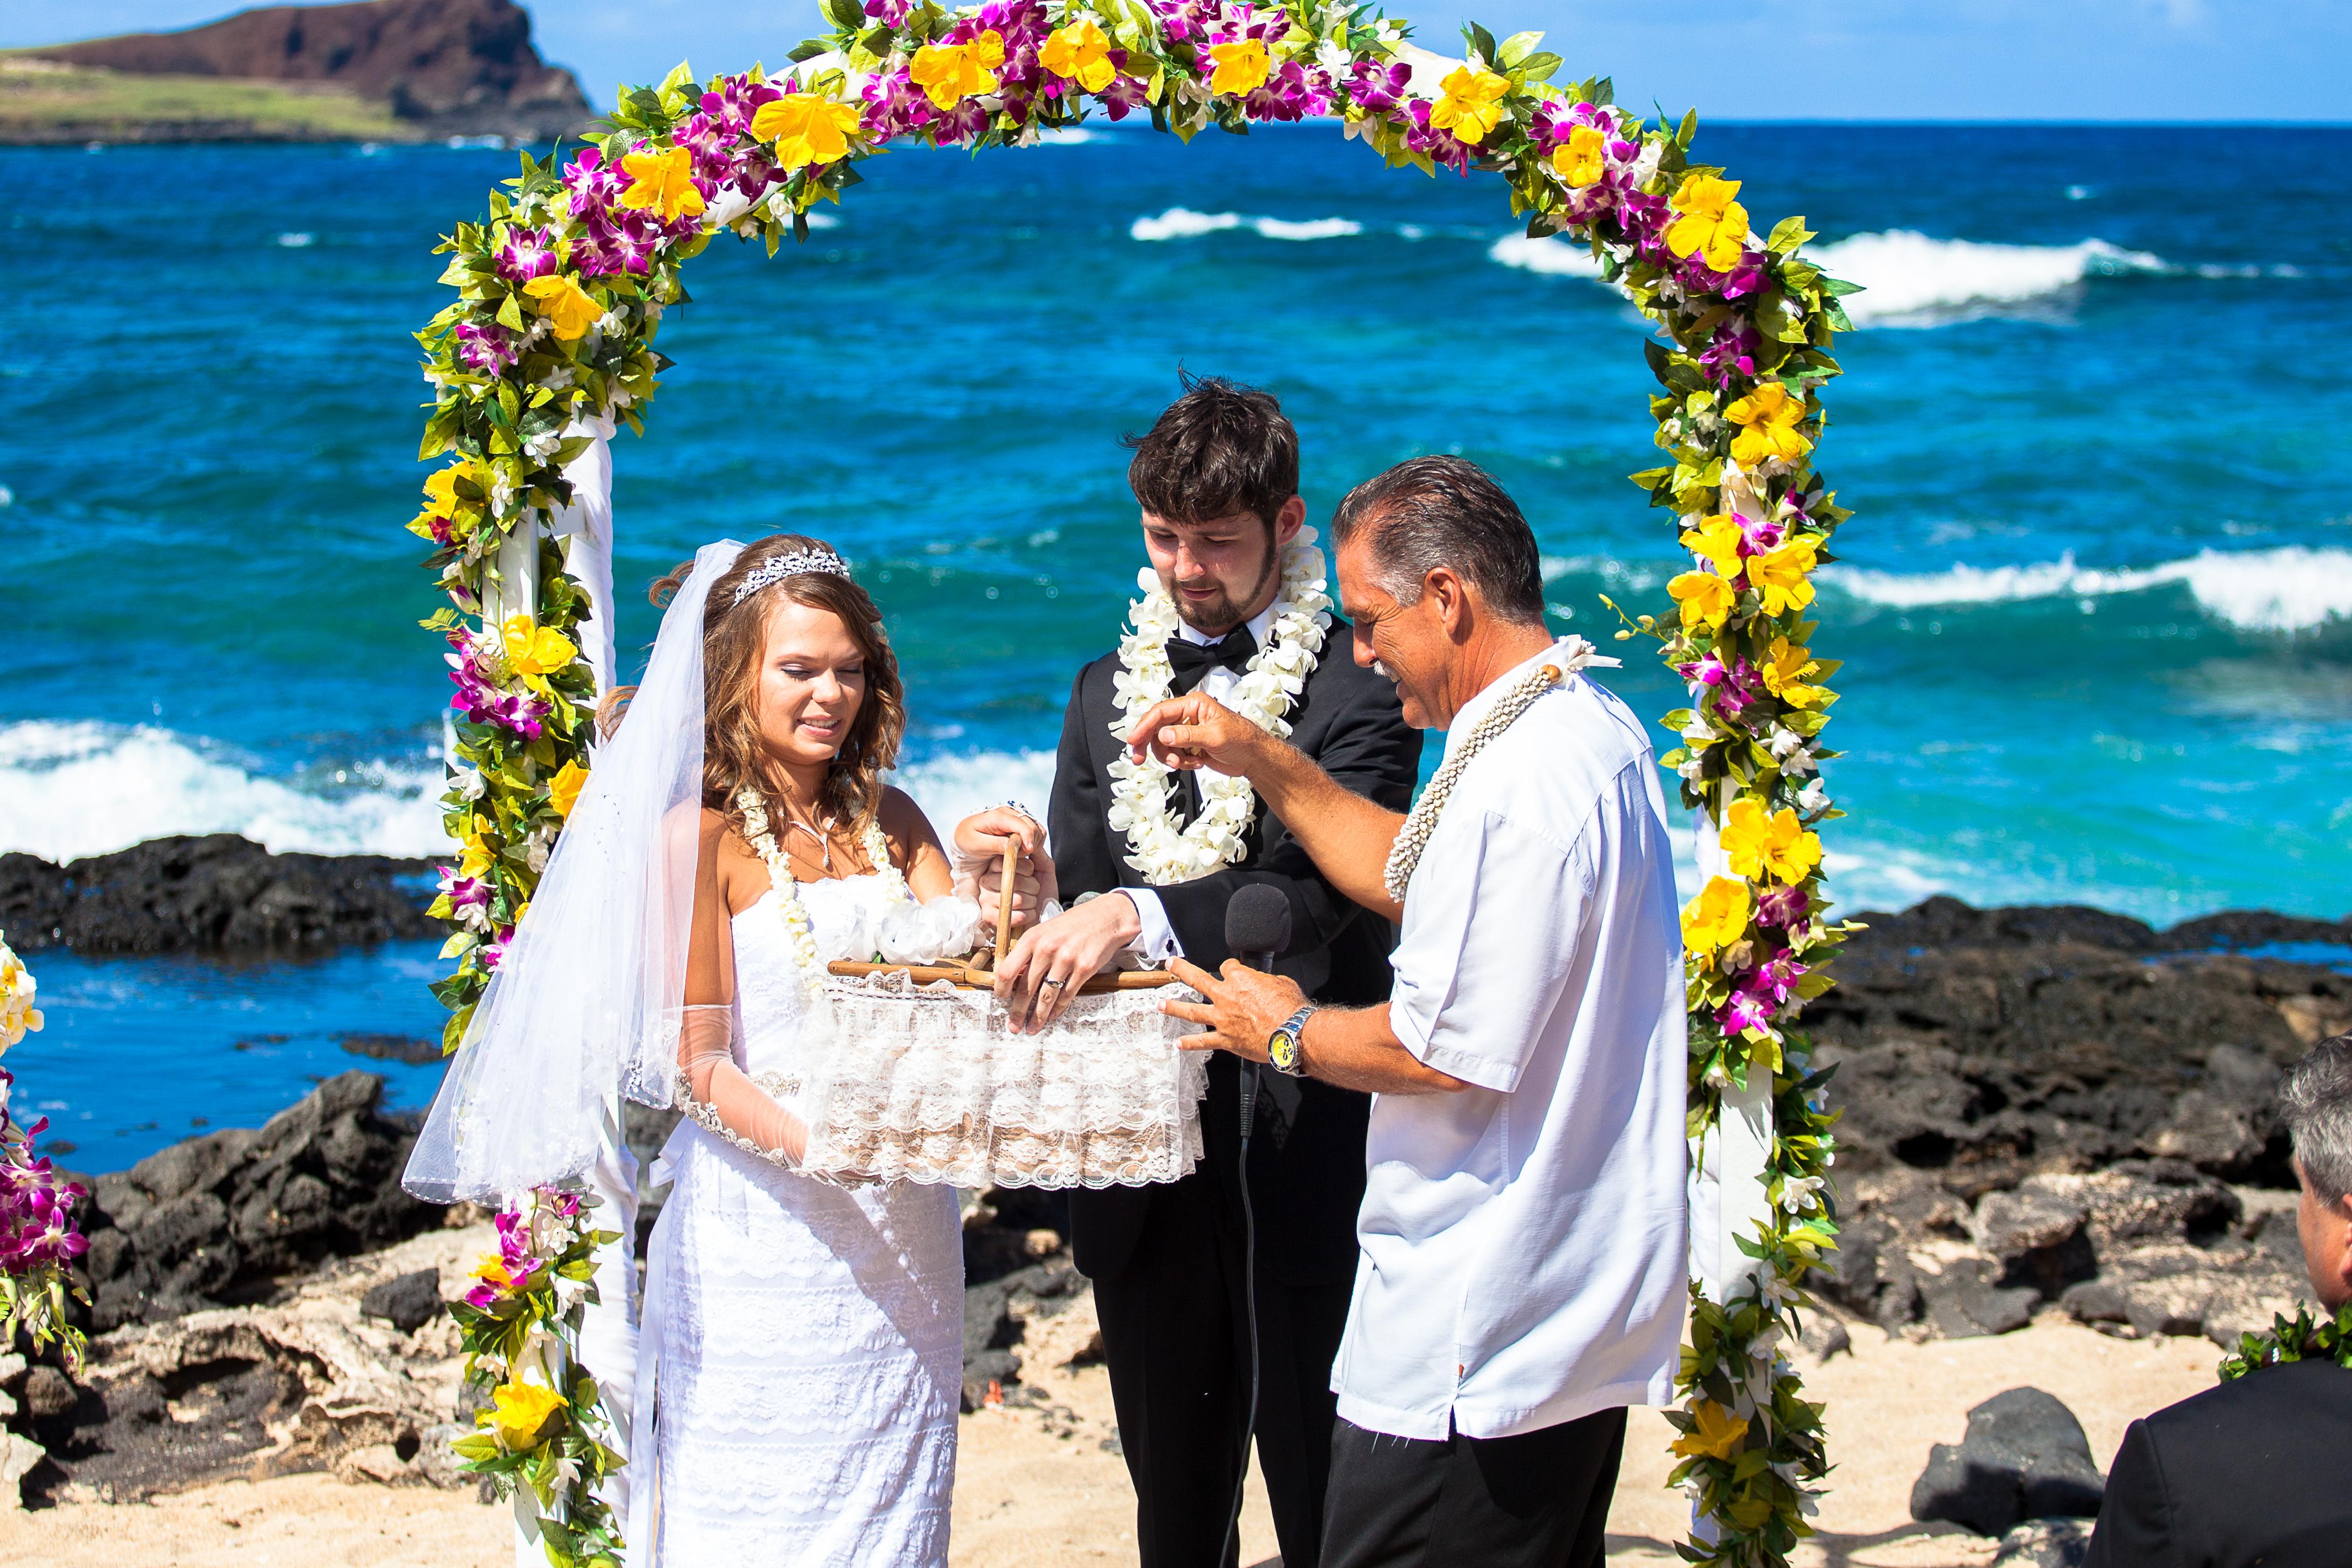 Hawaii Wedding Dove Release byalohaislandwedding.com -1